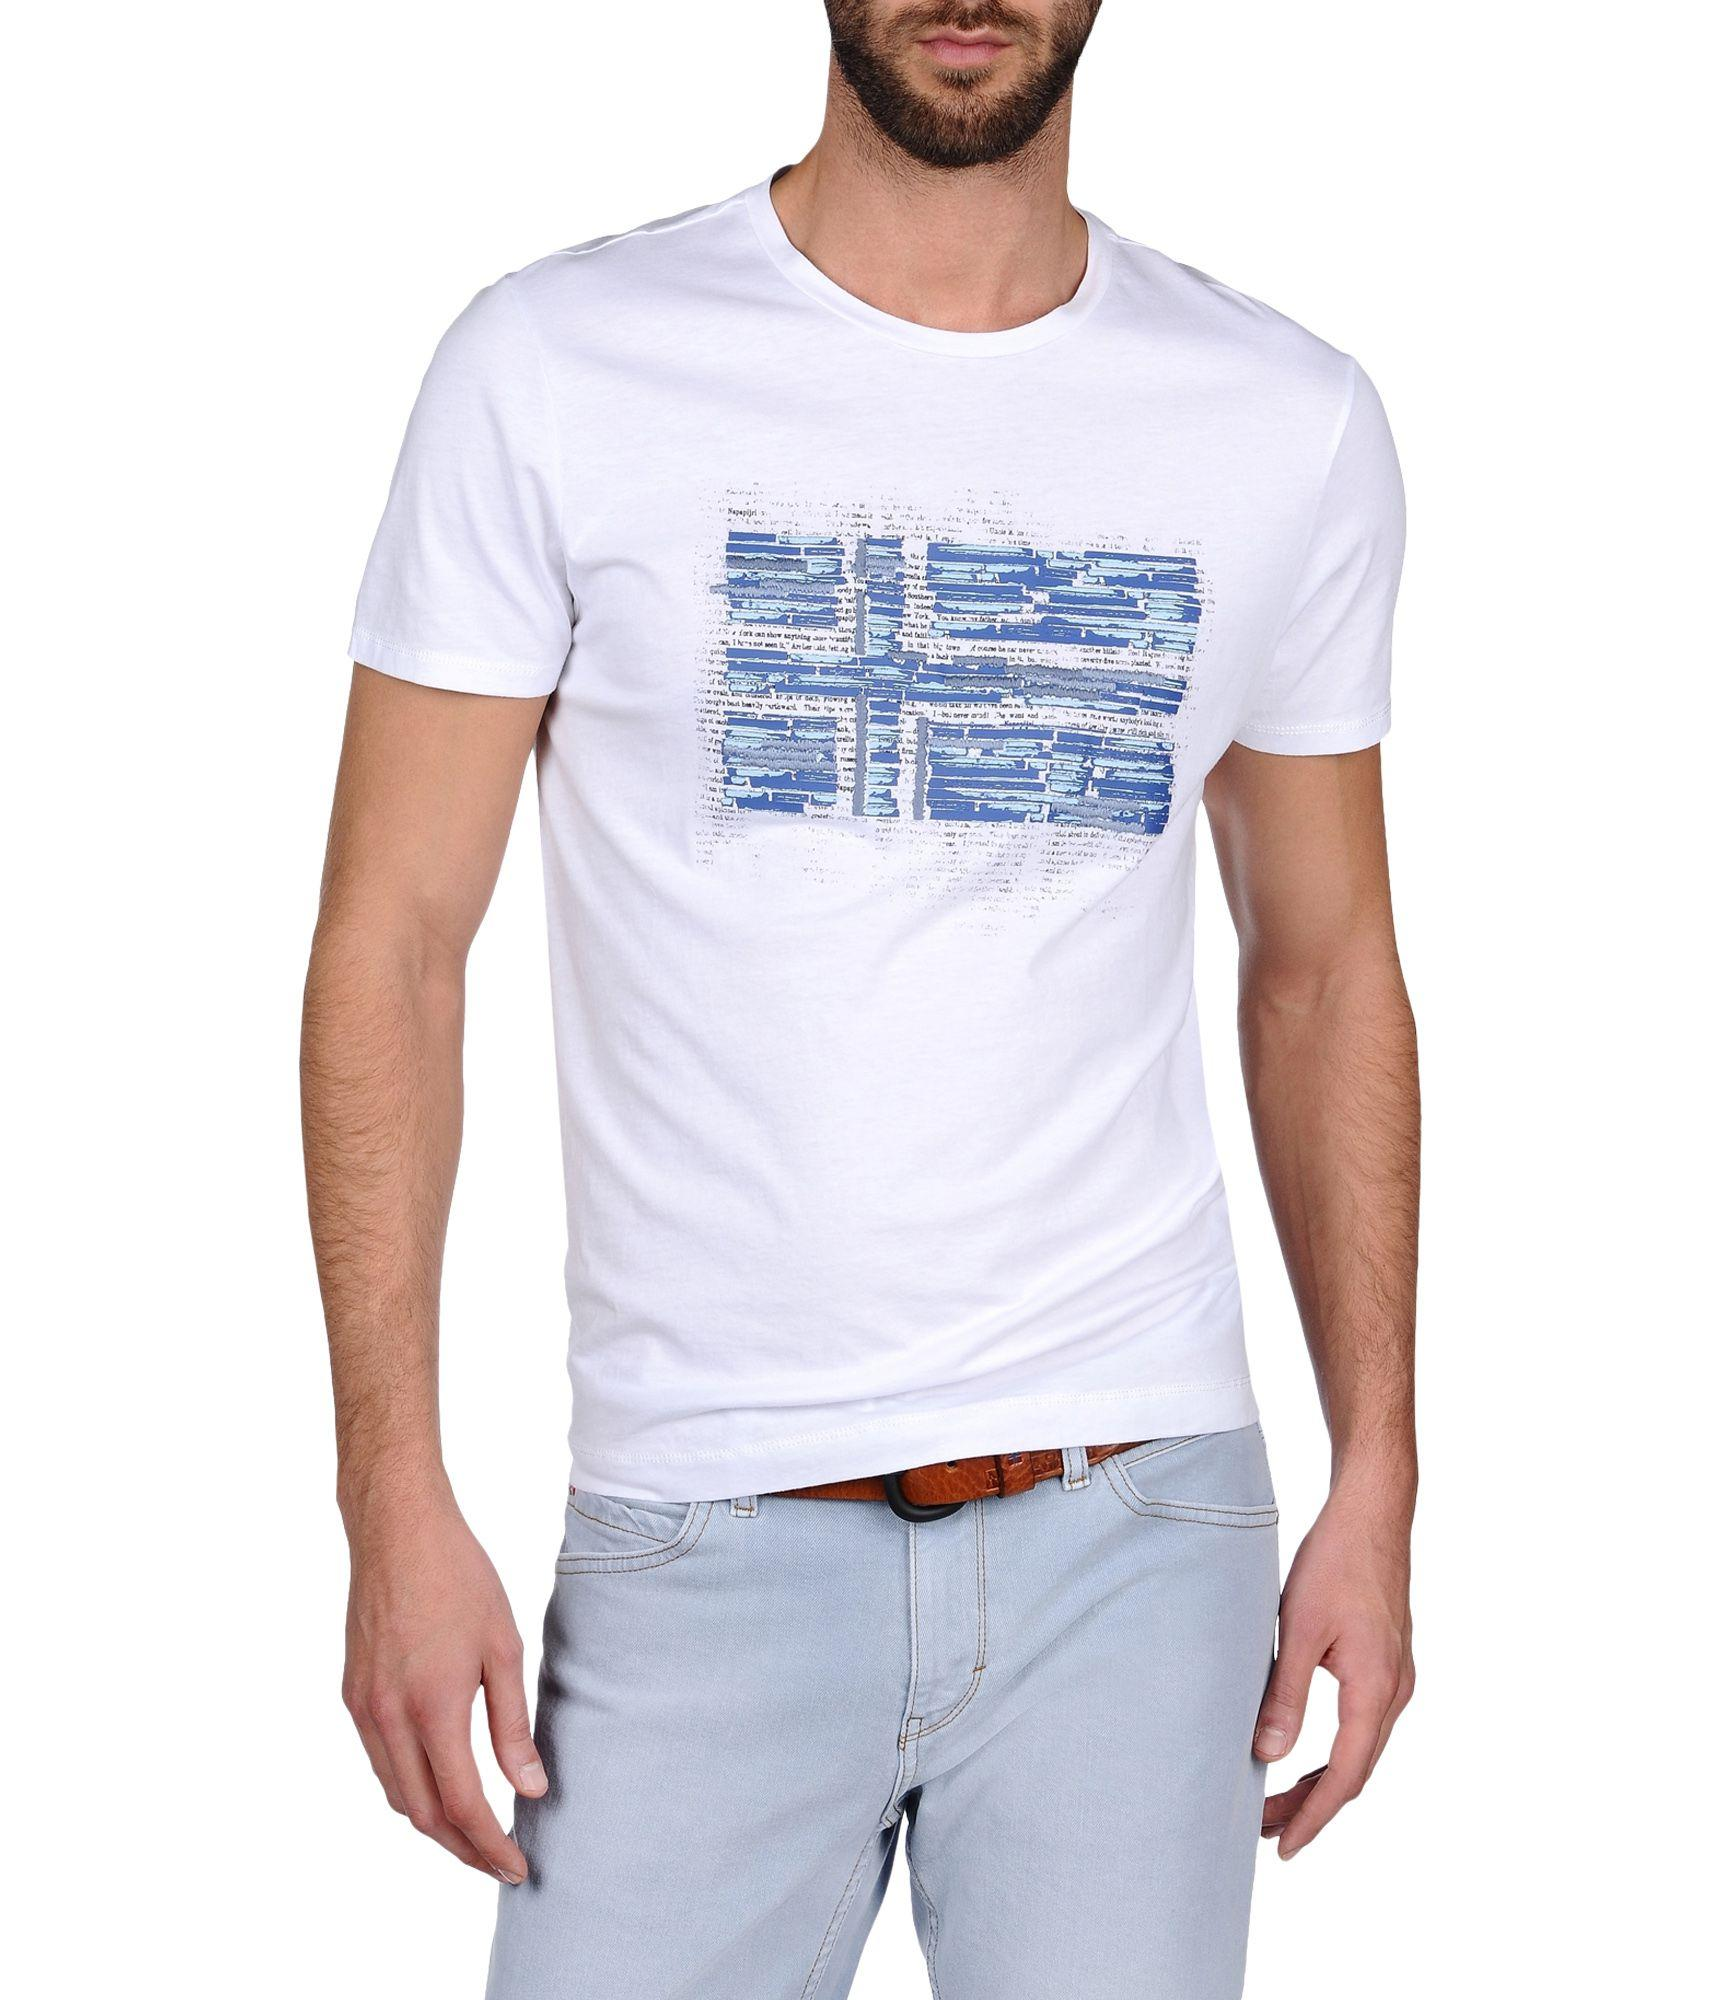 lyst napapijri short sleeve t shirt in white for men. Black Bedroom Furniture Sets. Home Design Ideas